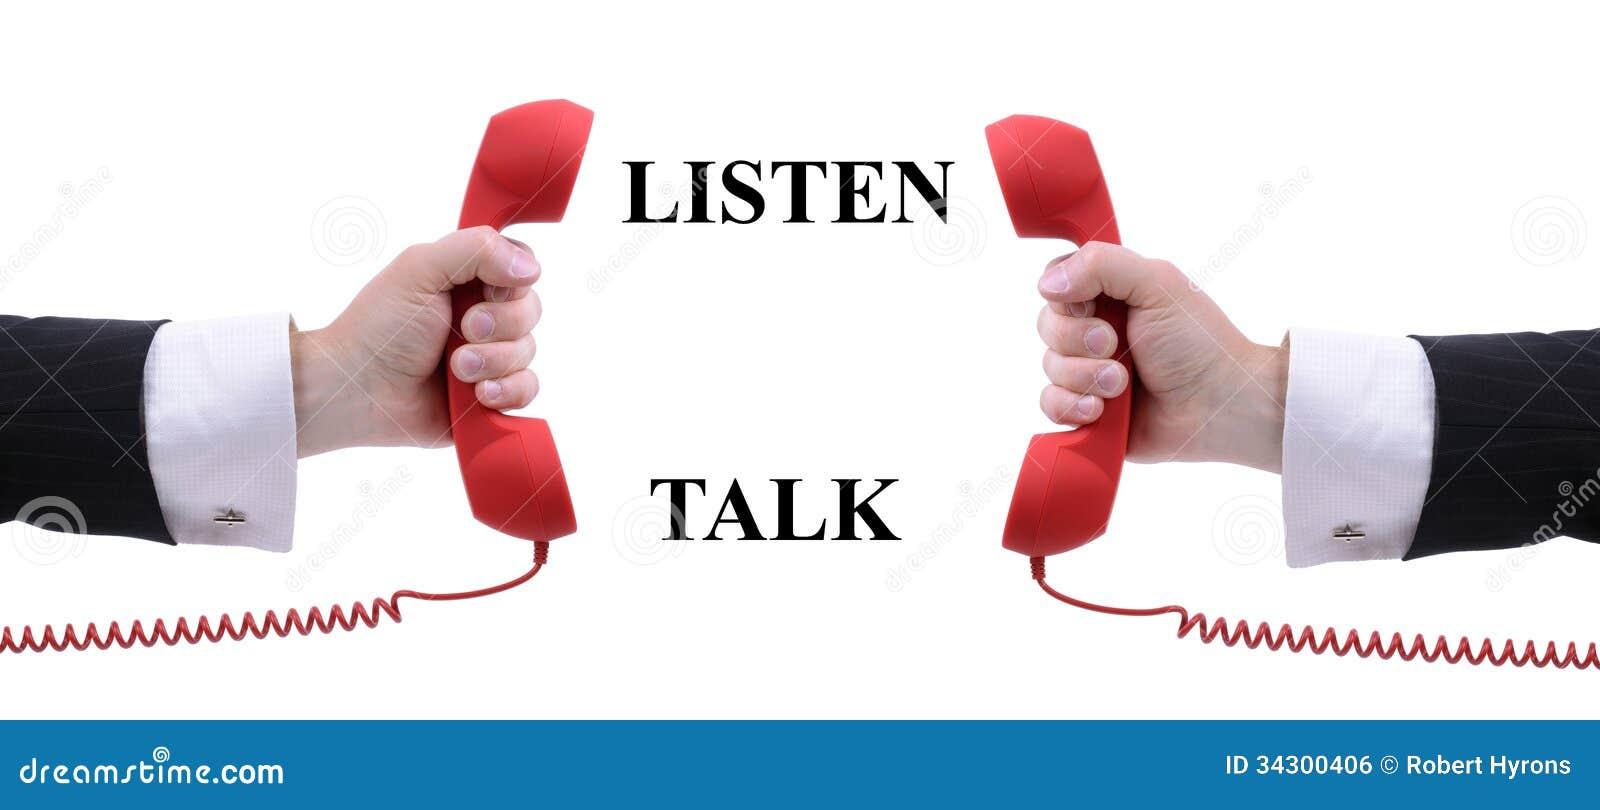 listen to a talk_Listen and talk stock photo. Image of caucasian, equipment - 34300406